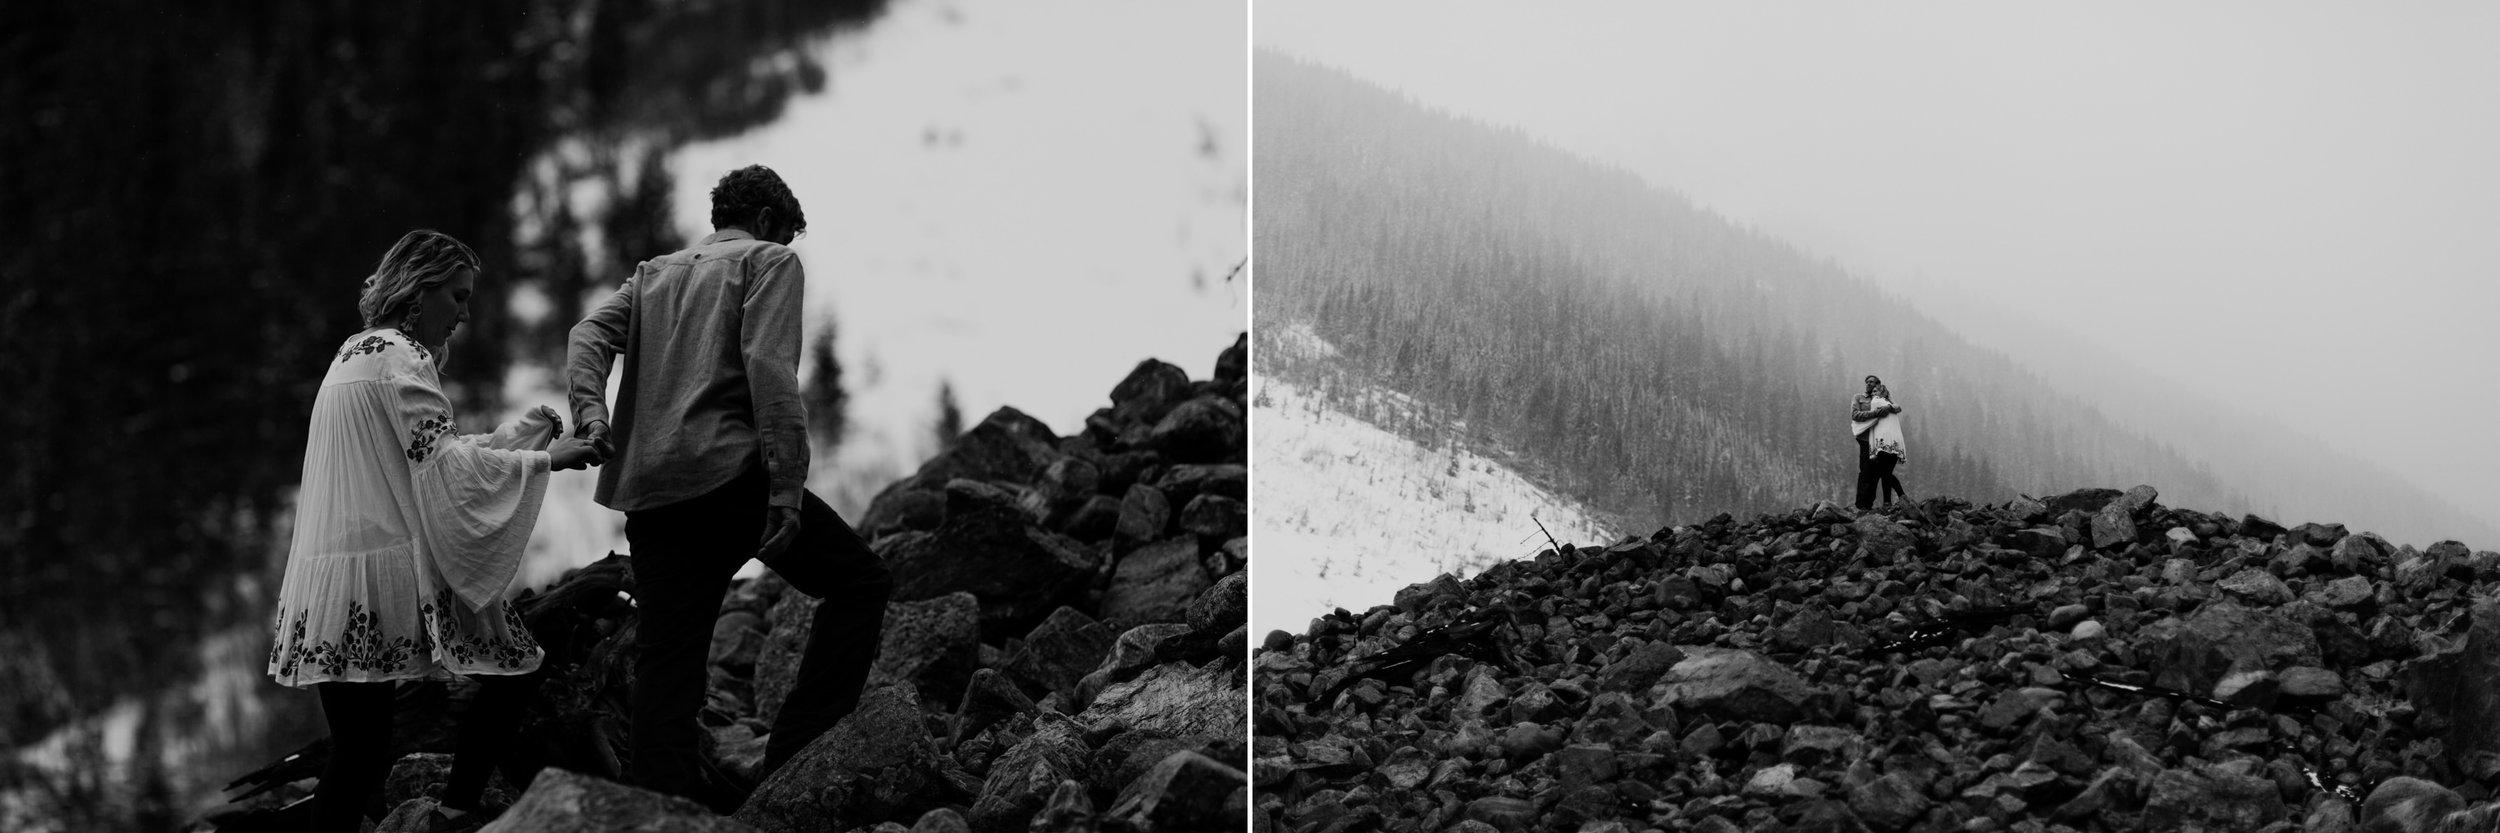 colorado-mountain-engagements-64.jpg